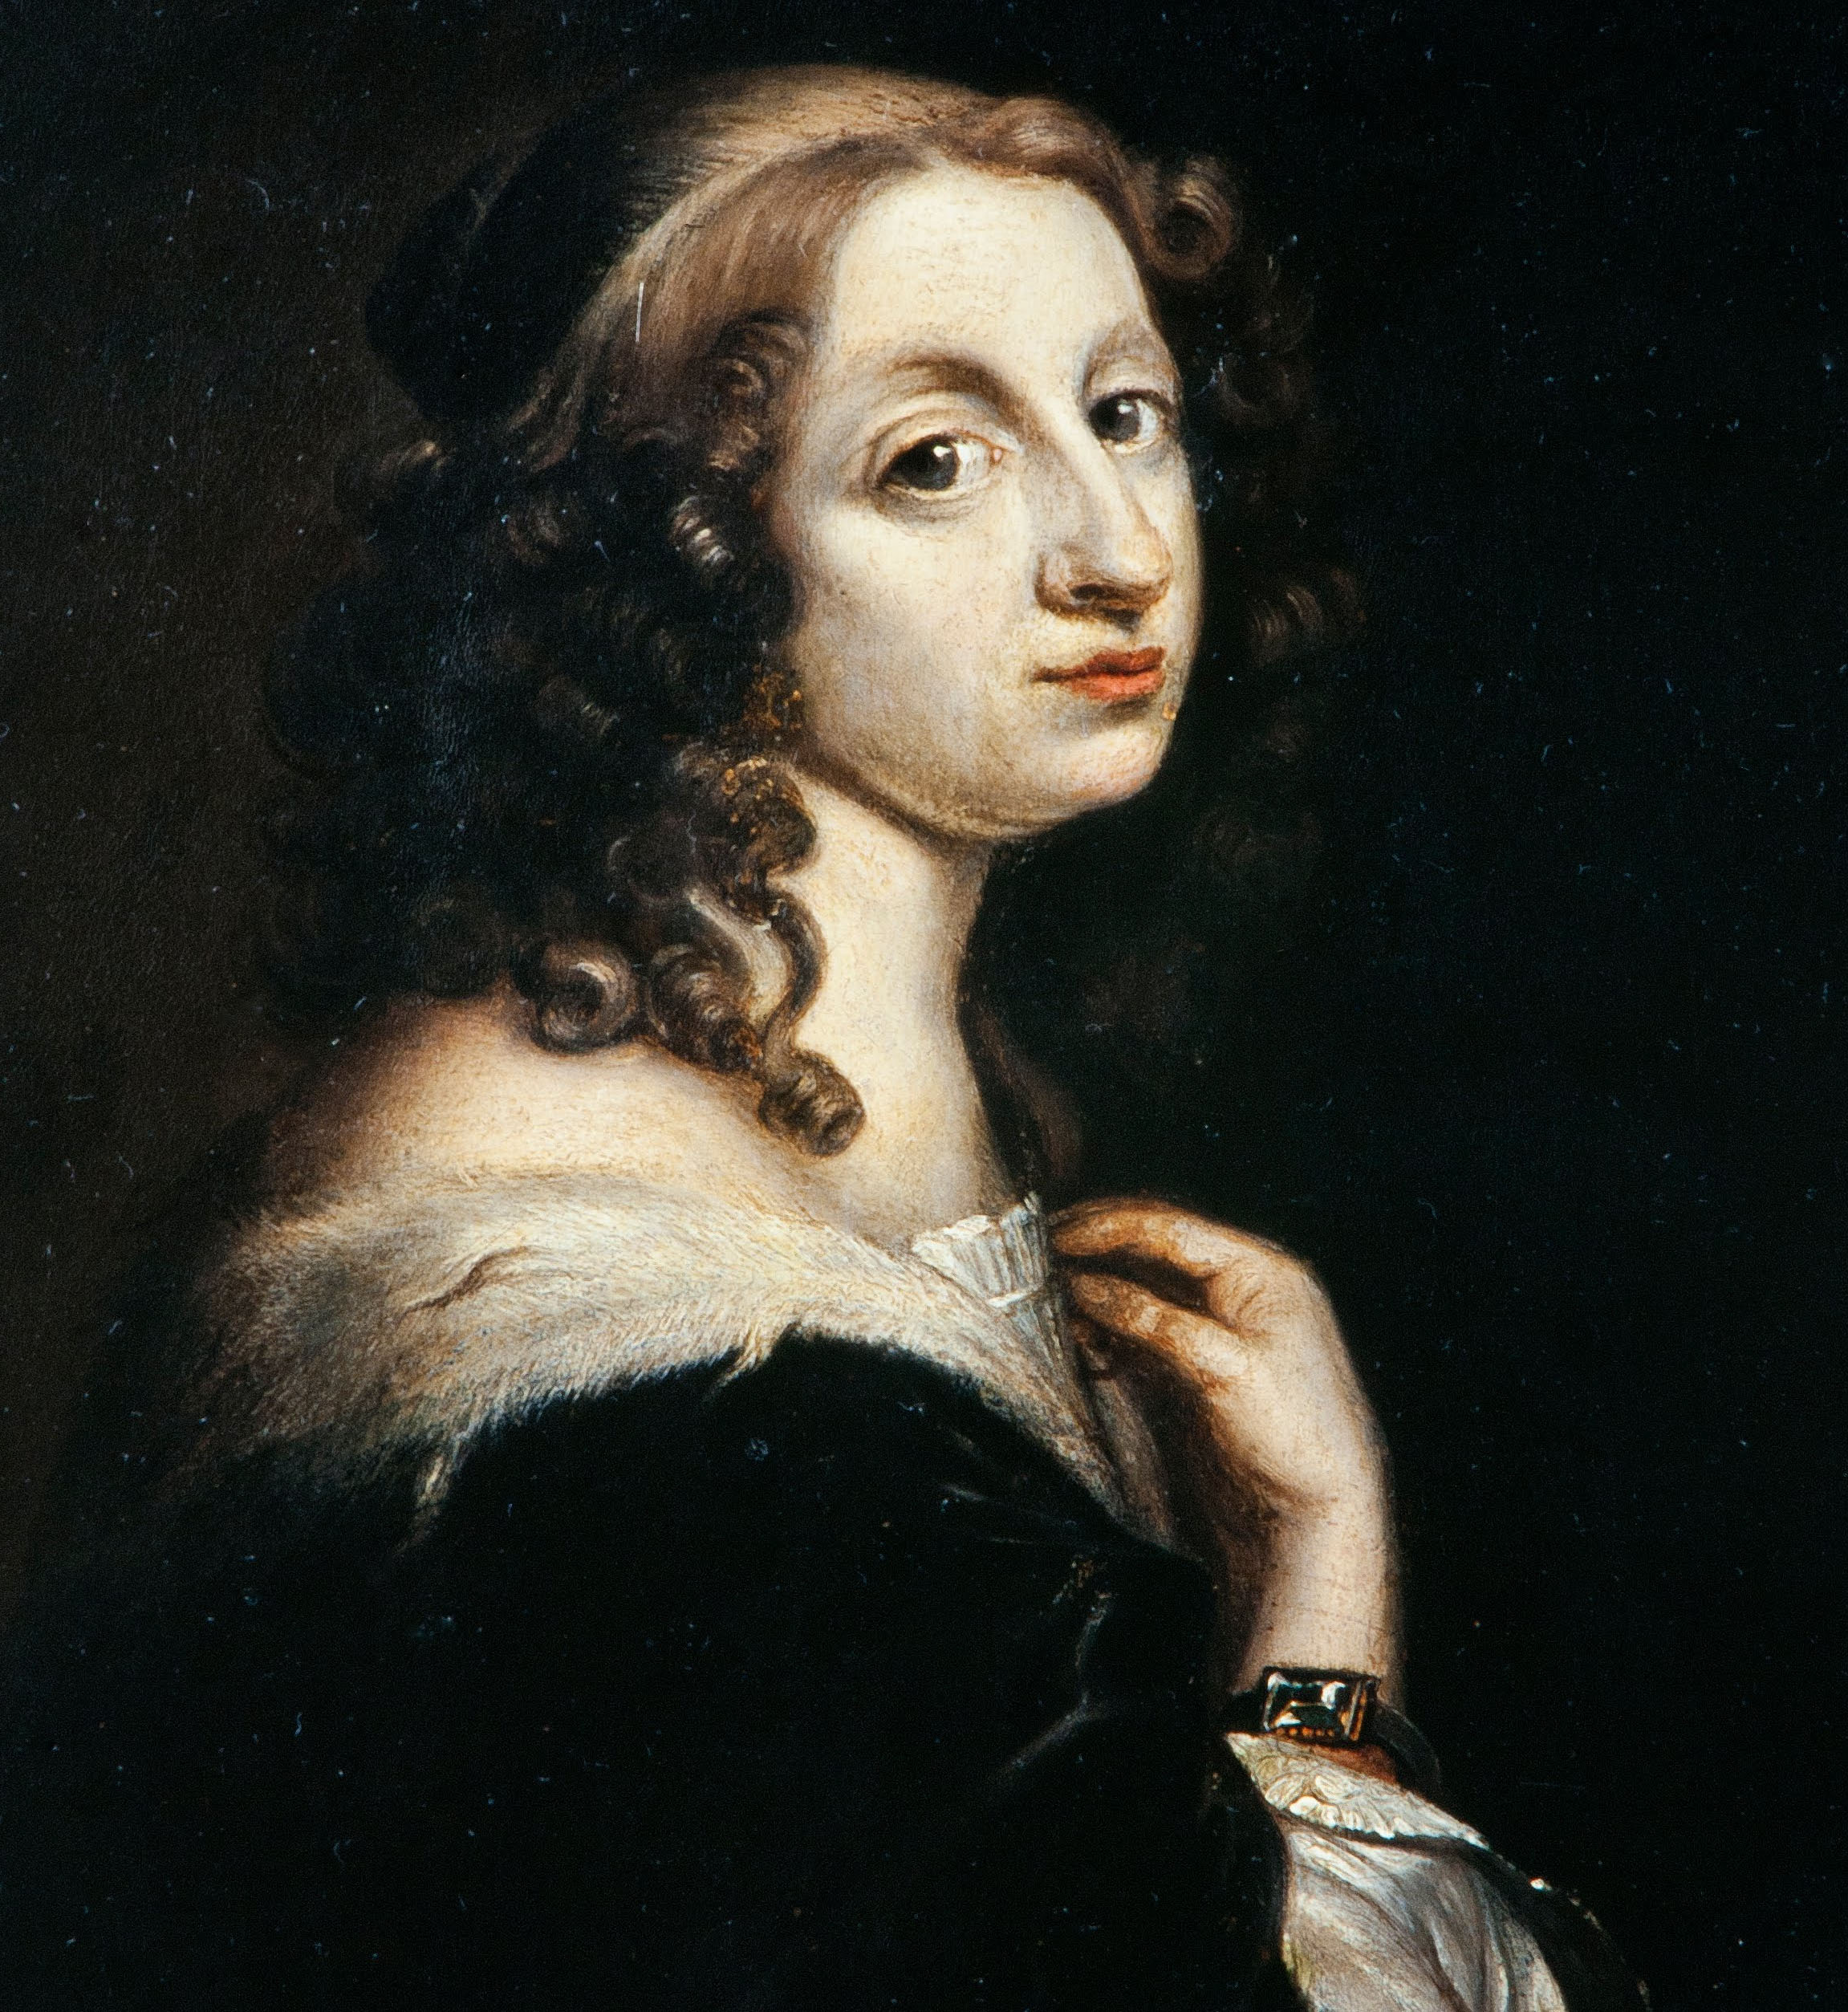 Cristina, regina di Svezia (Christina, Queen of Sweden)